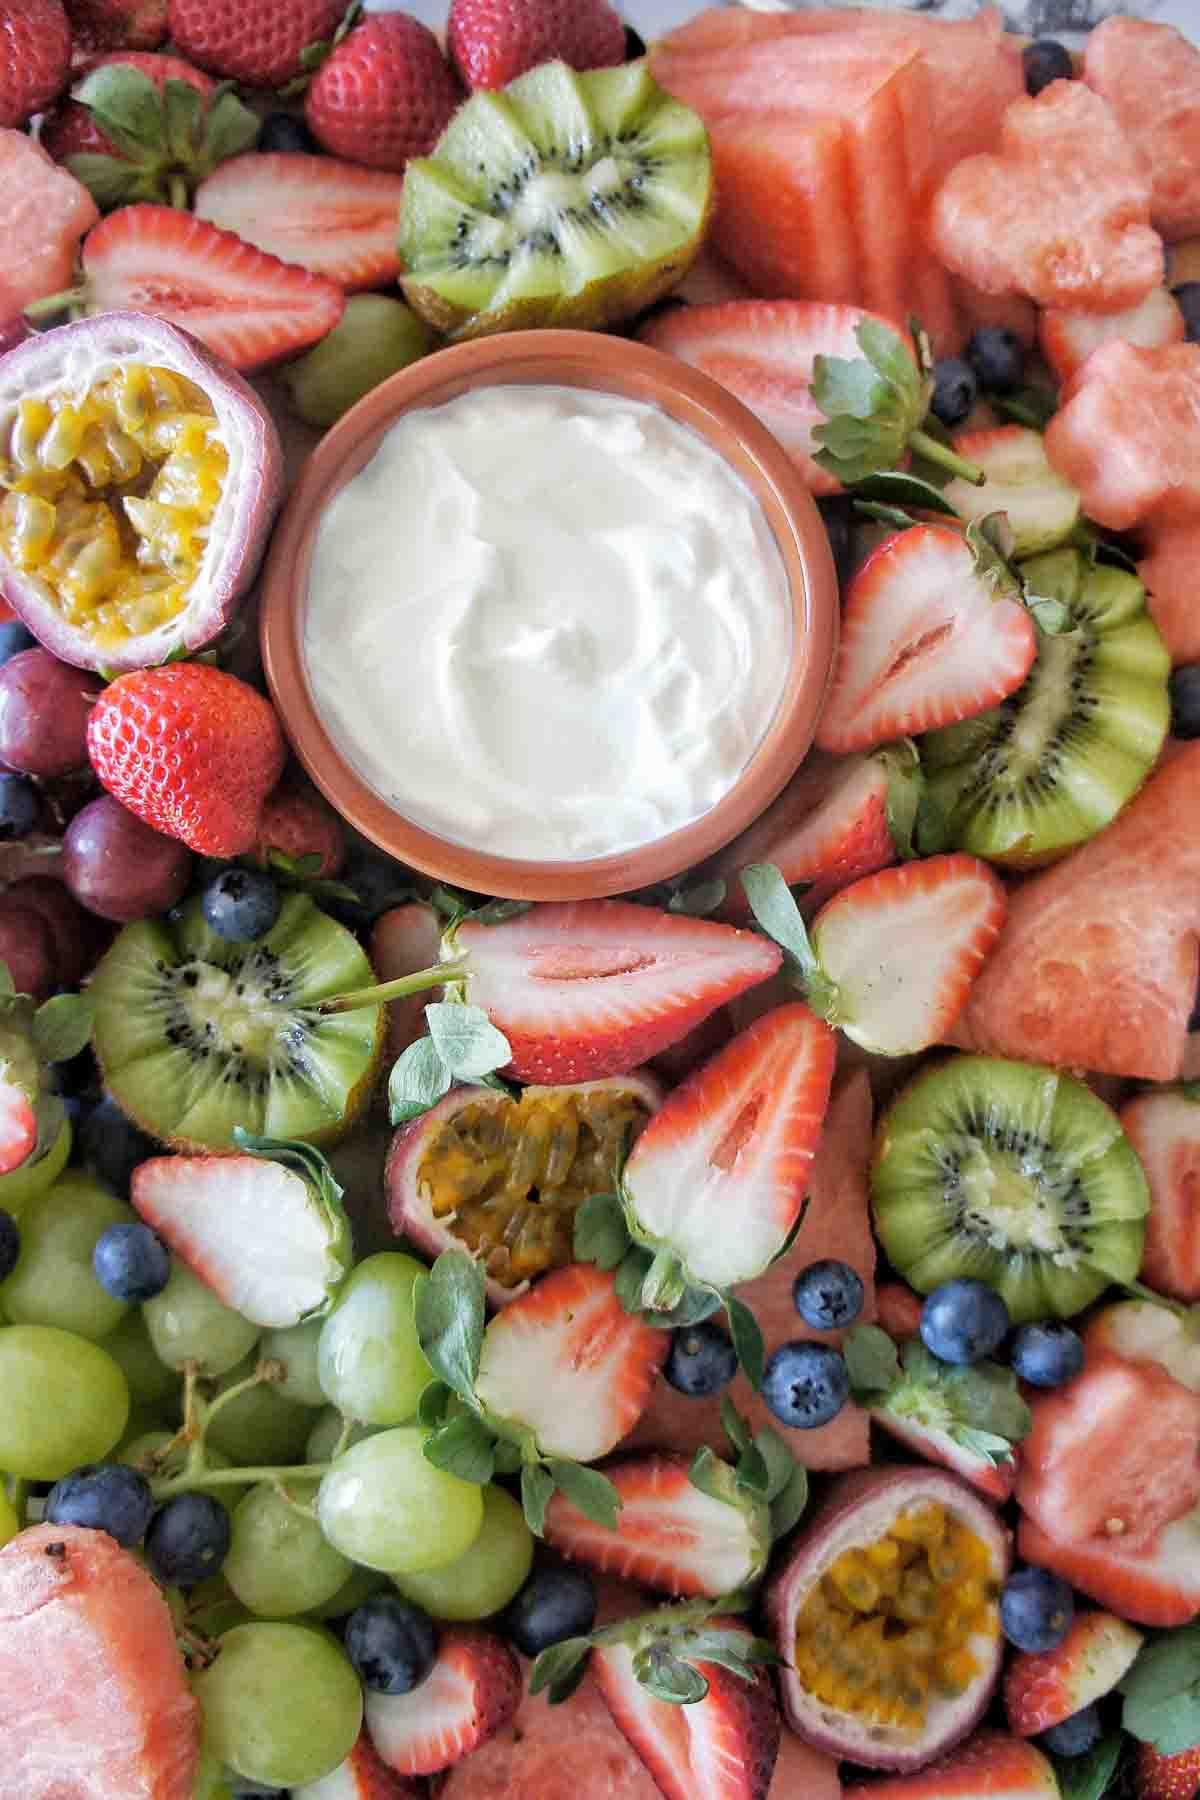 Bowl of yogurt on platter surrounded by fruit